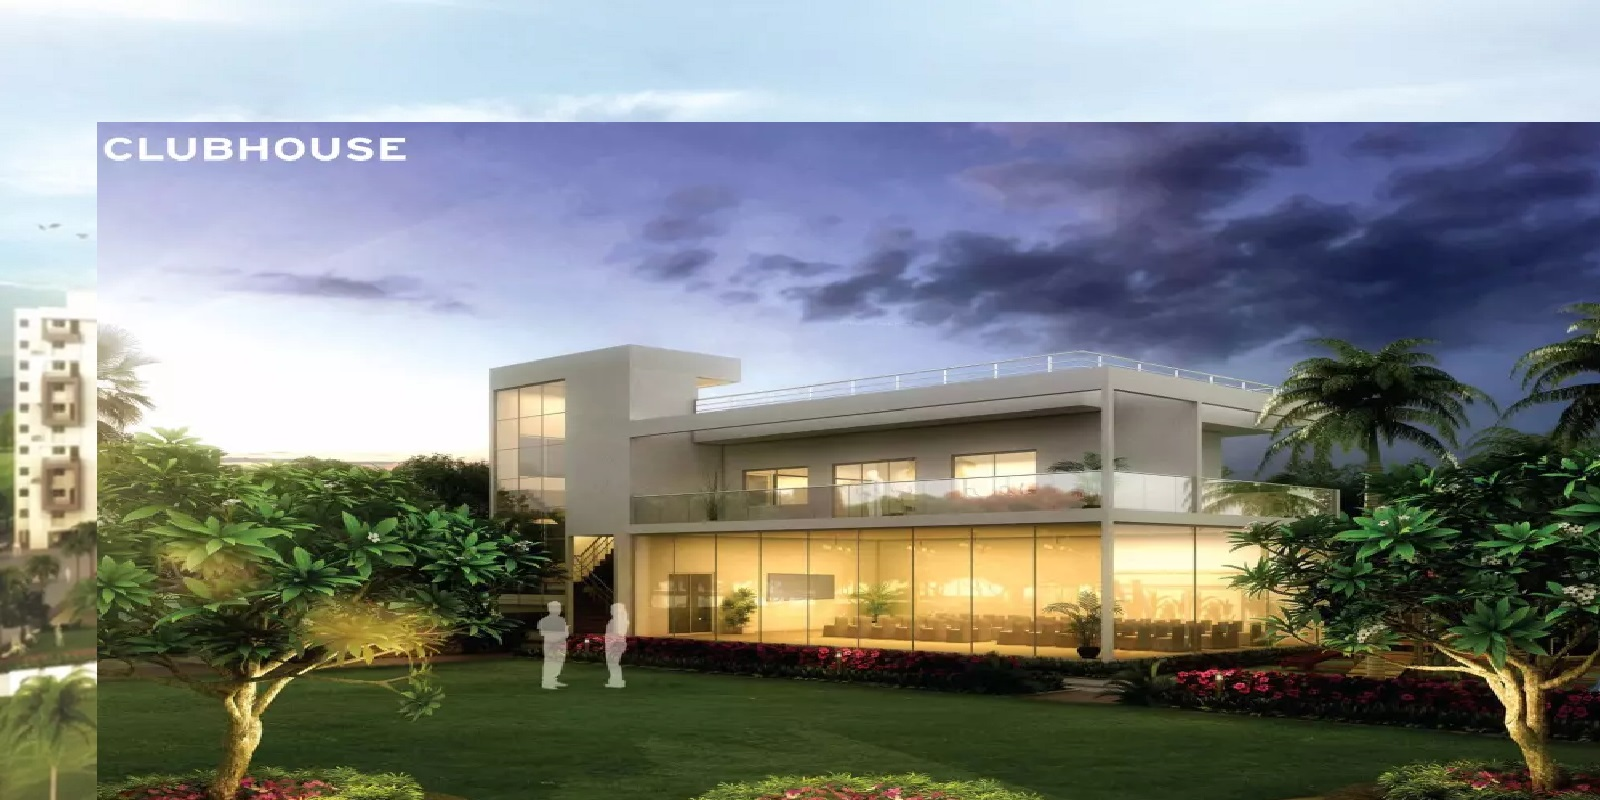 vilas javdekar yashwin anand clubhouse external image8